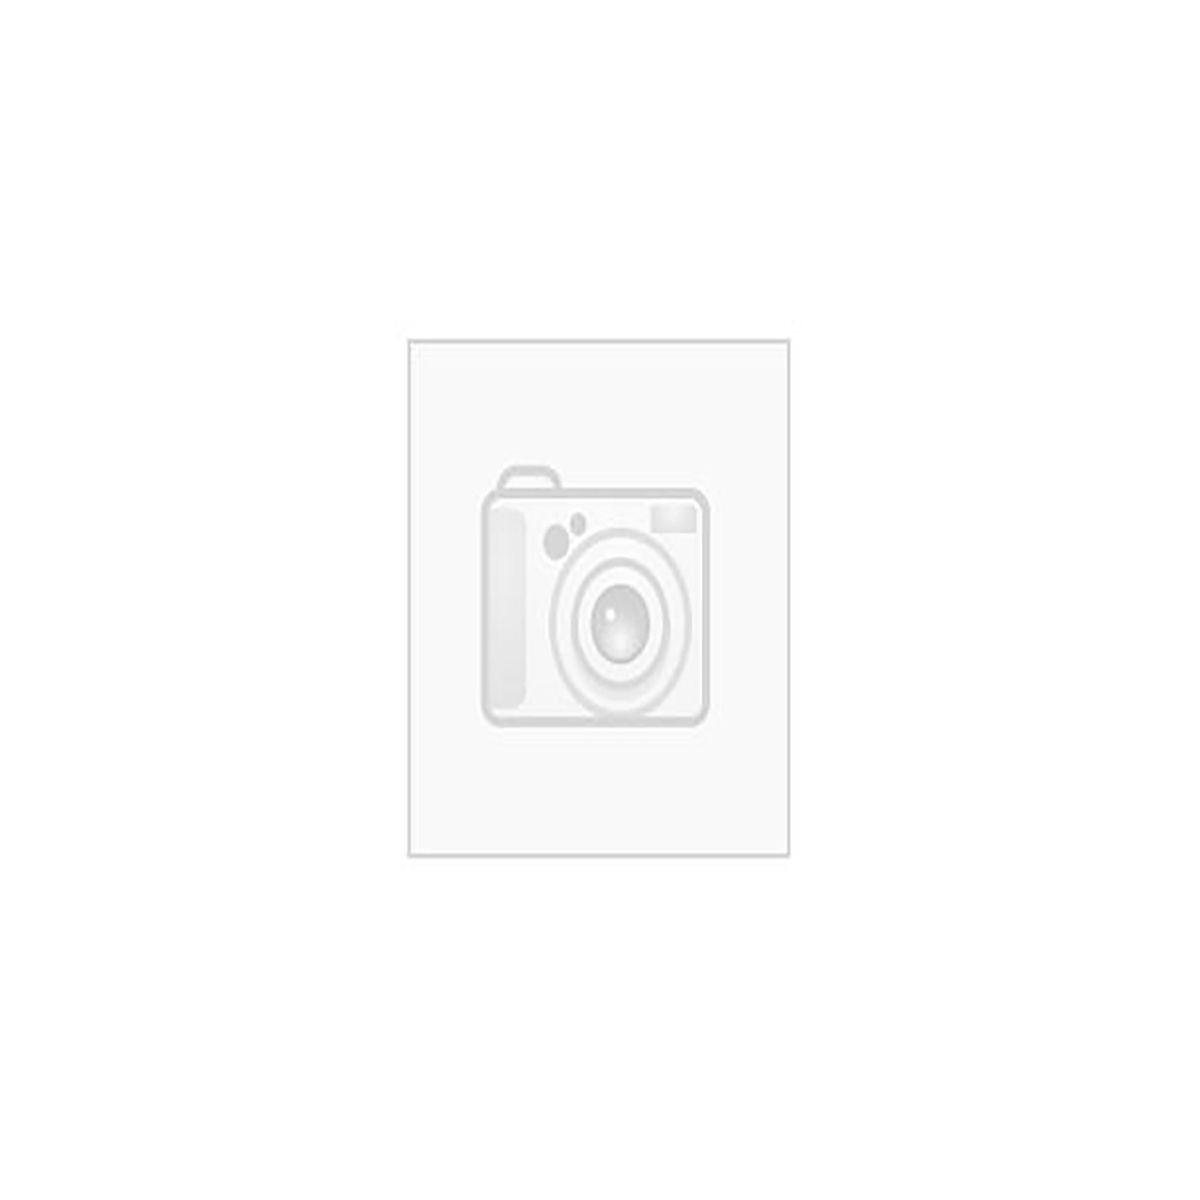 Sanipex Fordelerskap 2 x 8 uttak